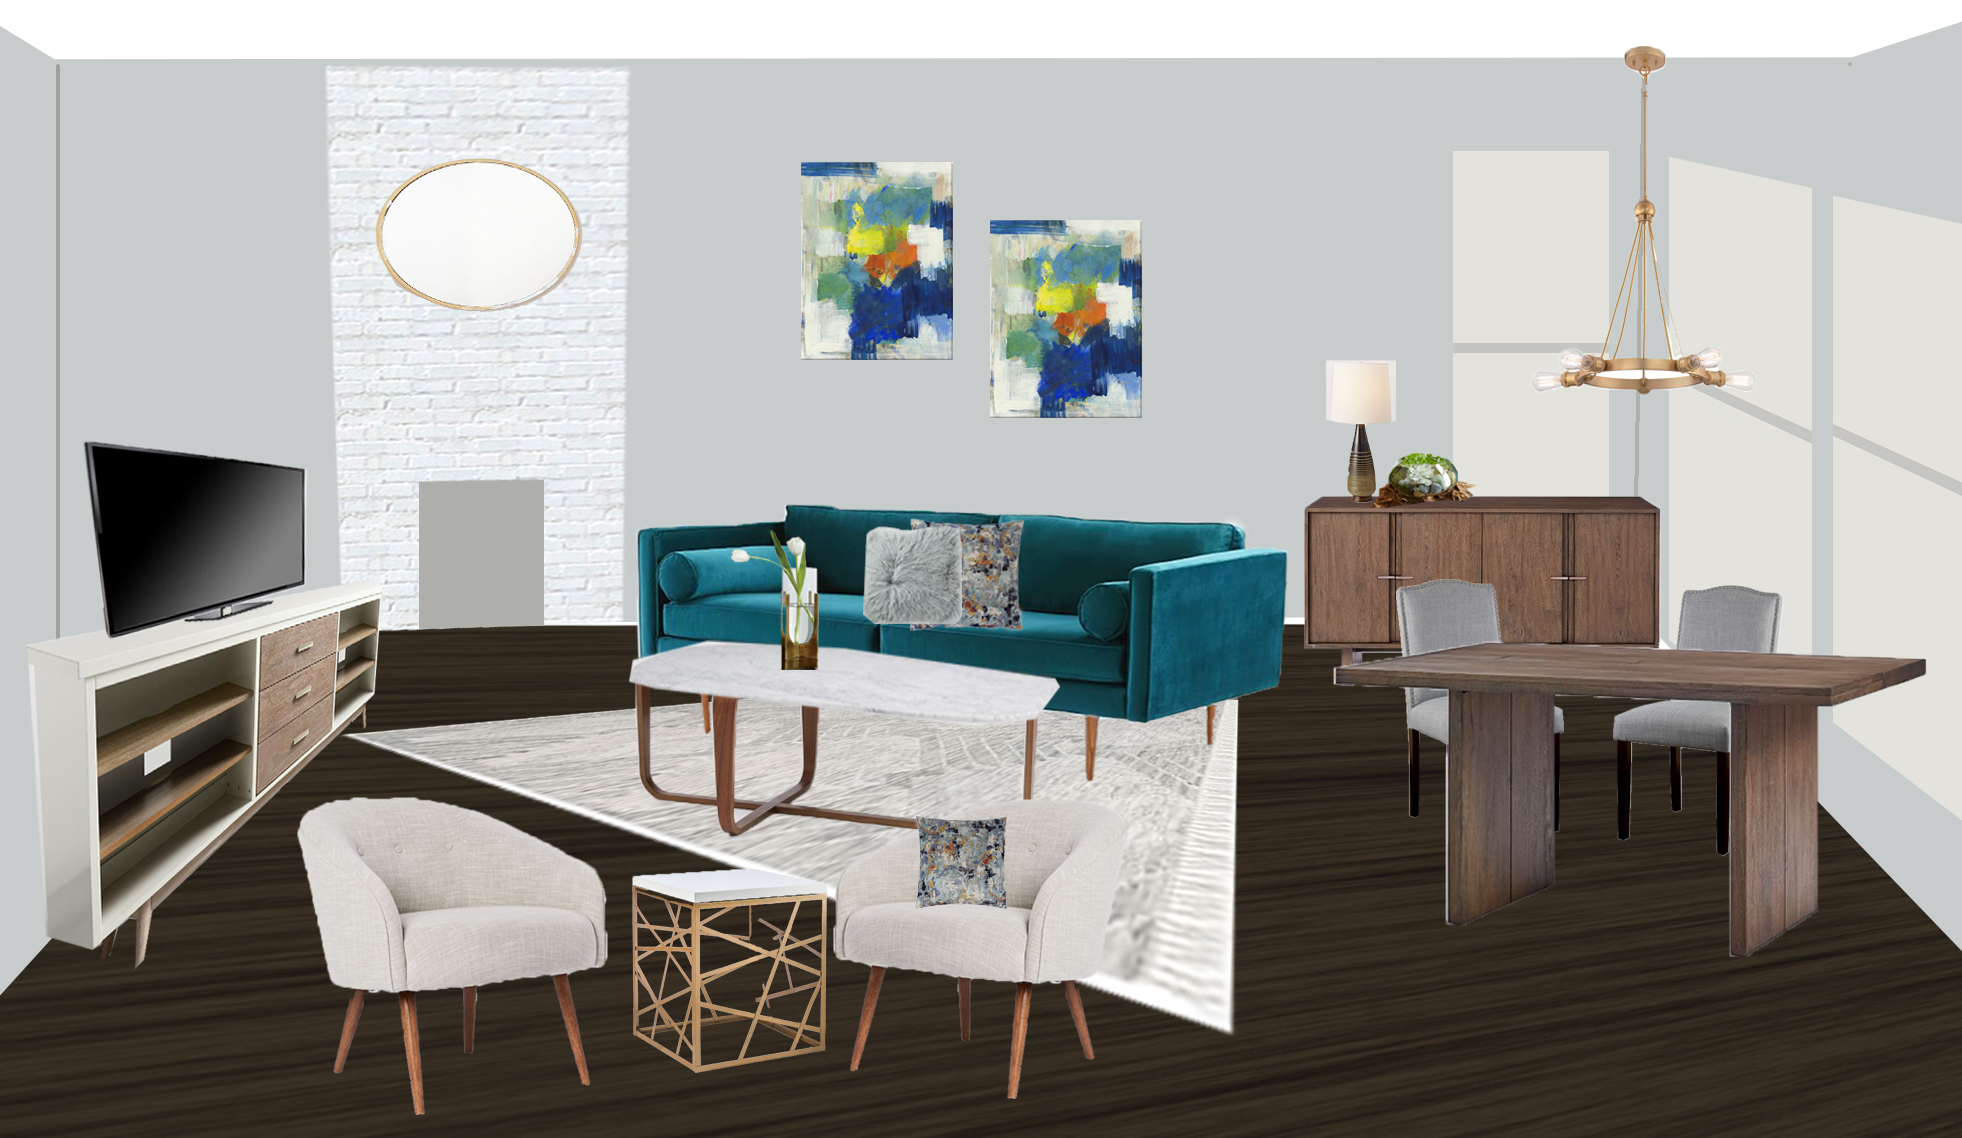 Rendering for new living room